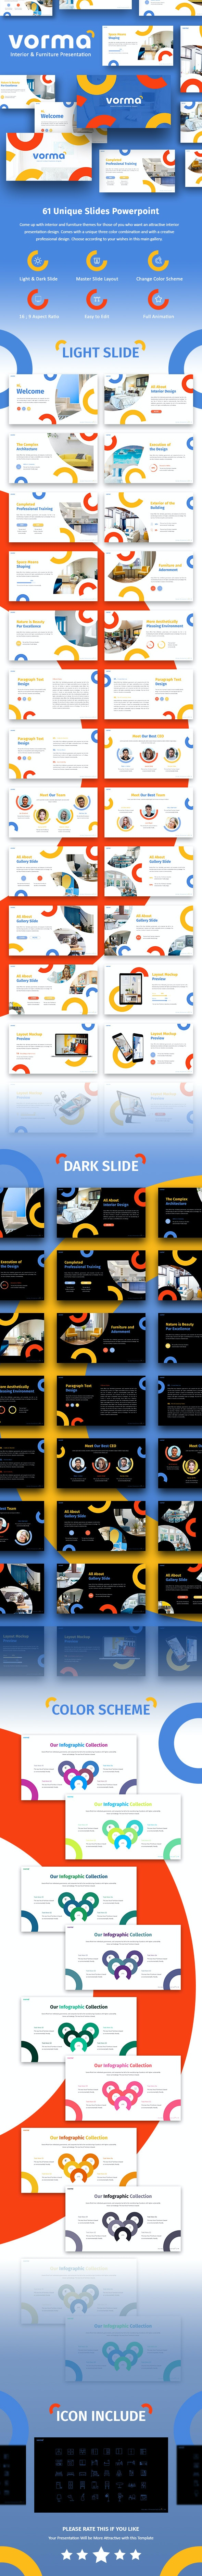 Vorma Interior & Furniture Presentation Template - Creative PowerPoint Templates